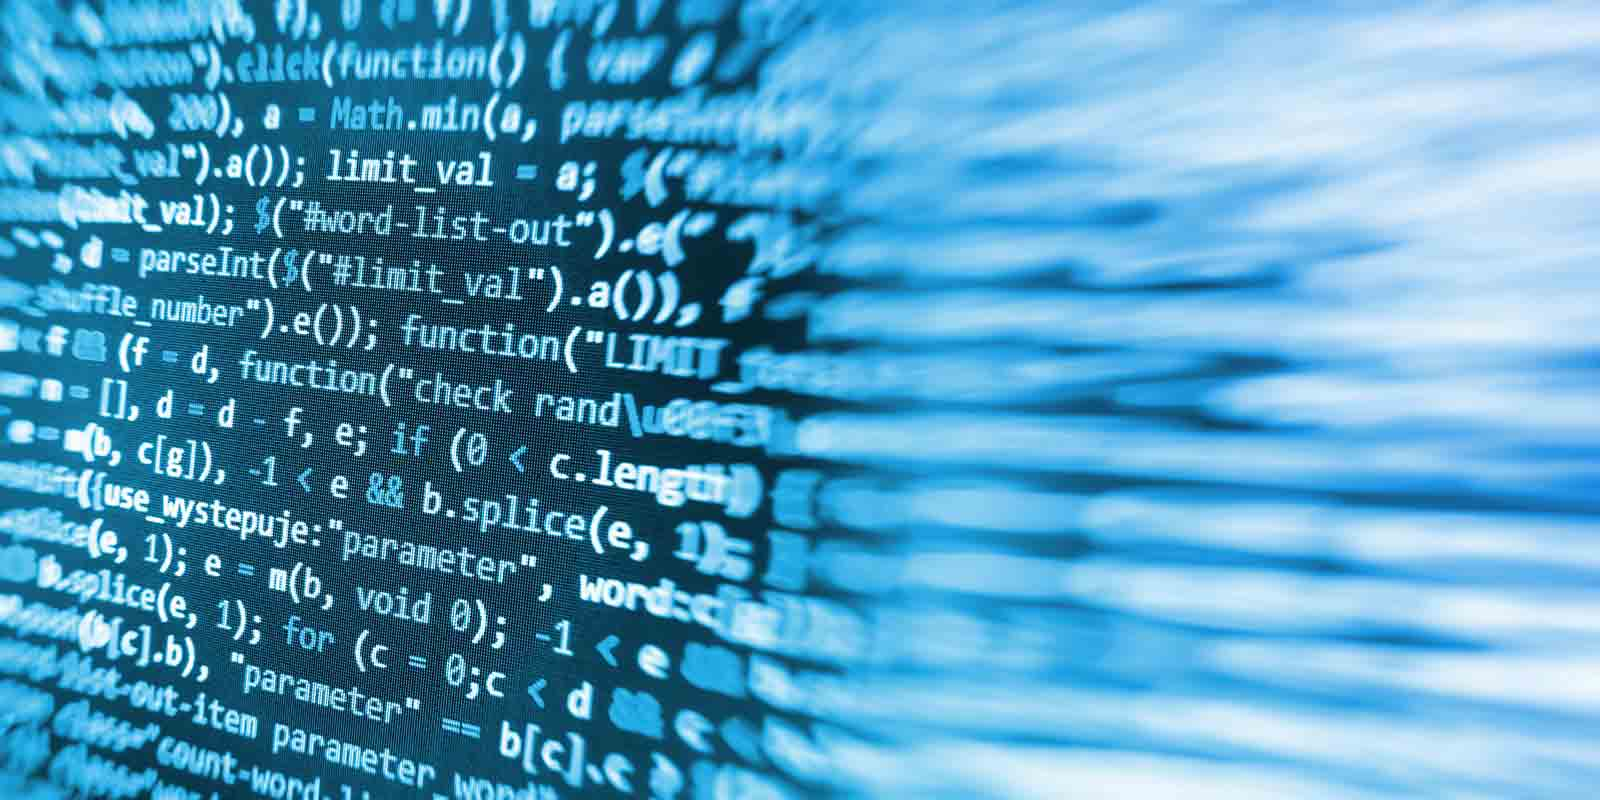 NetSuite Scripting